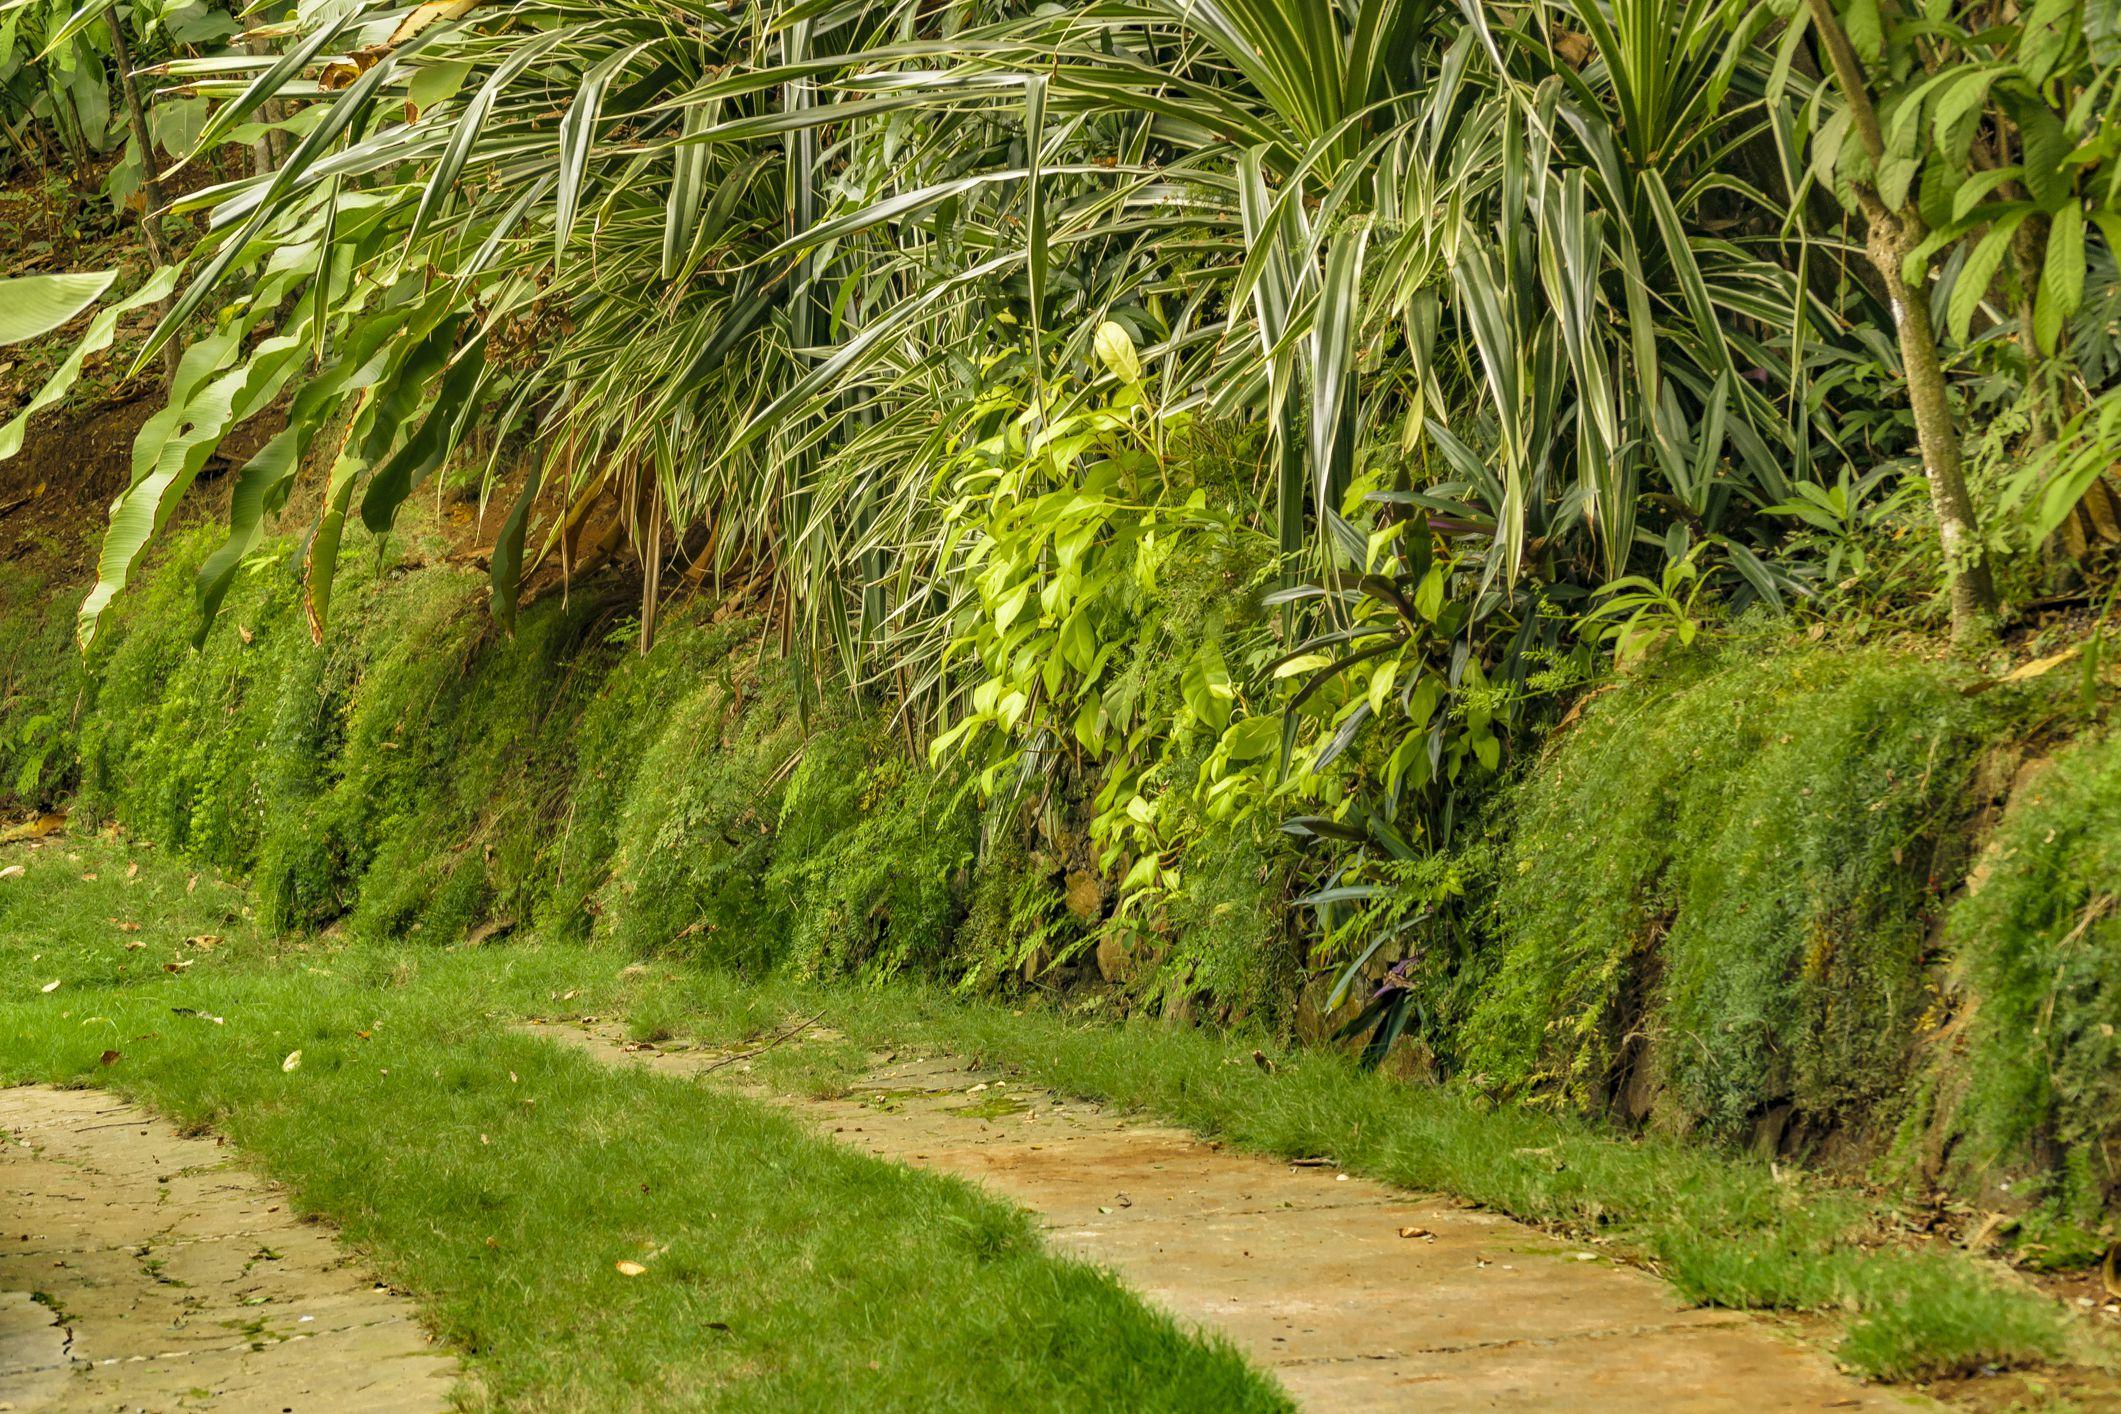 Empty path at the Botanical Gardens in Ecuador